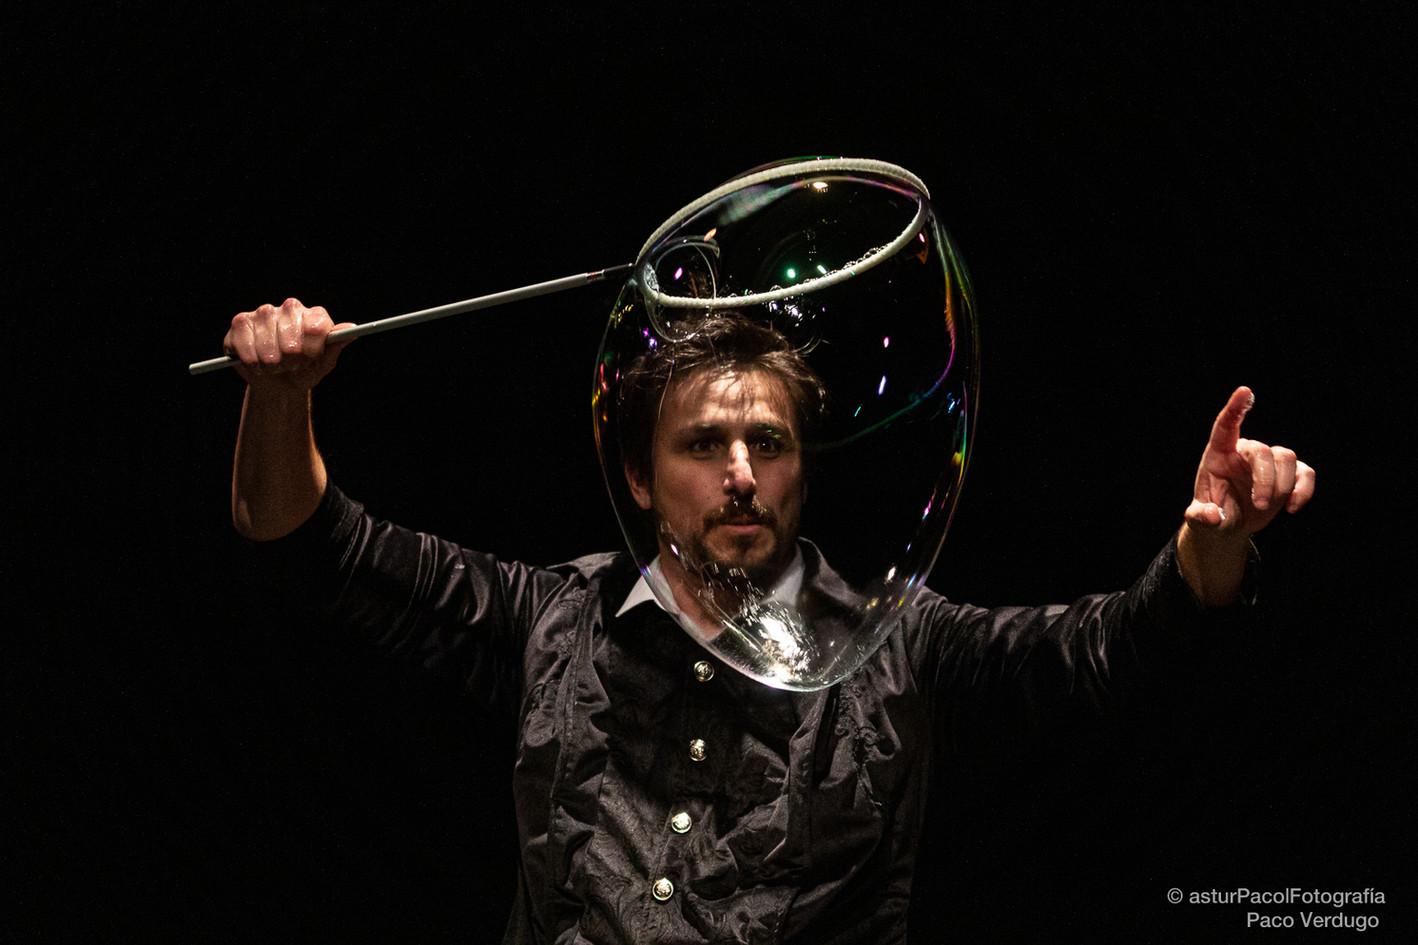 Preparando burbujas